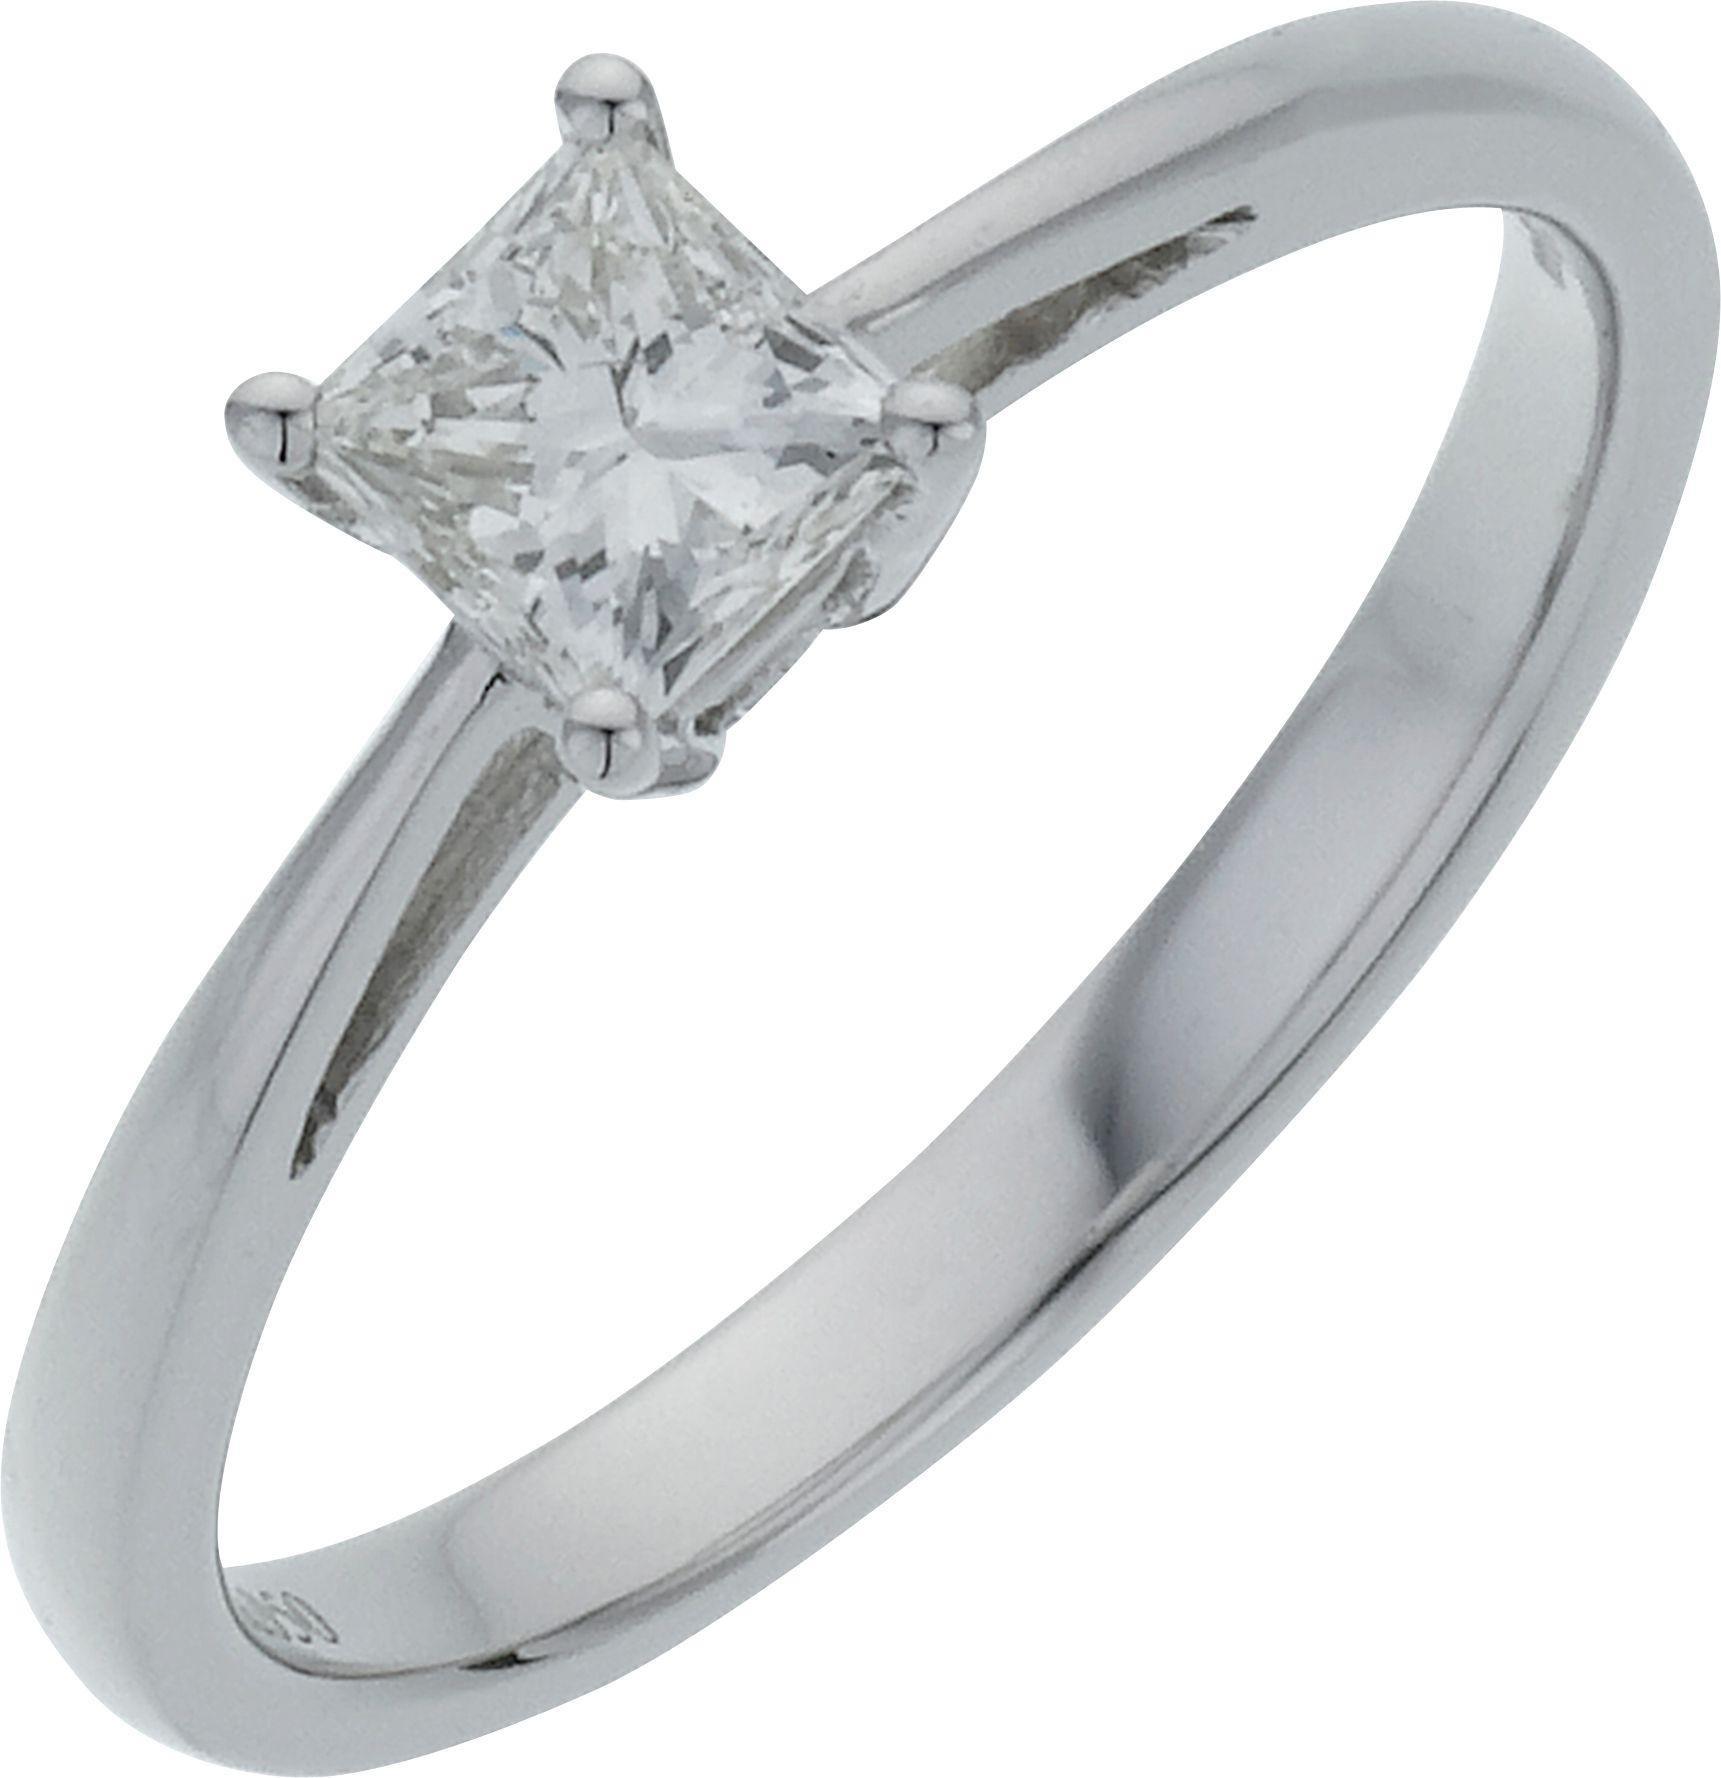 18 Carat White Gold 05 Carat Diamond - Princess Cut Diamond - Ring - M